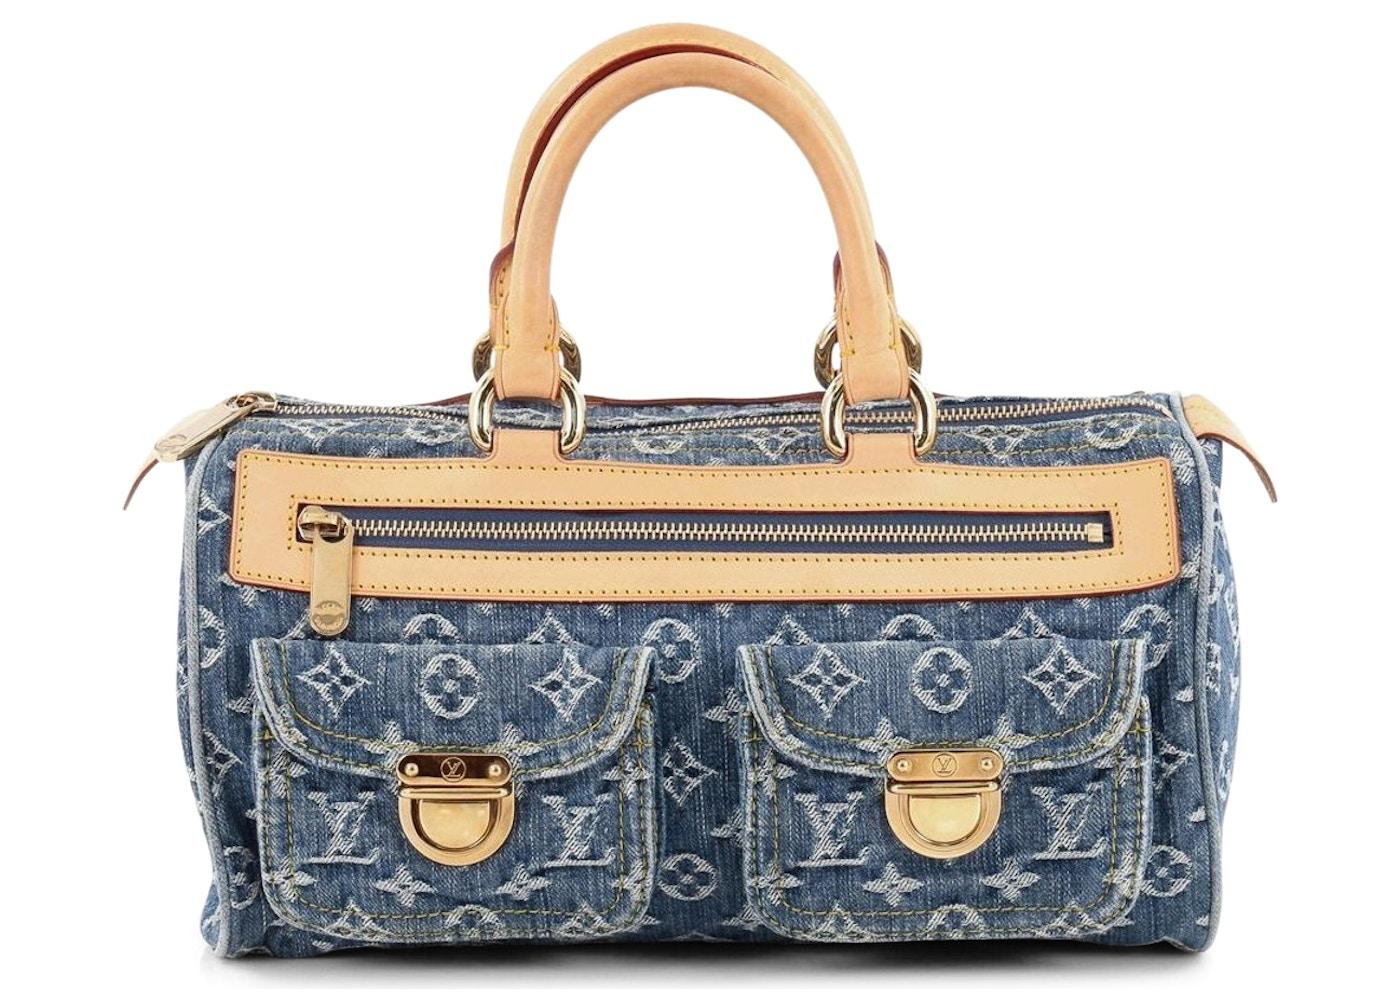 Louis Vuitton Speedy Neo Monogram Denim Blue. Monogram Denim Blue 83faf5d1f1639